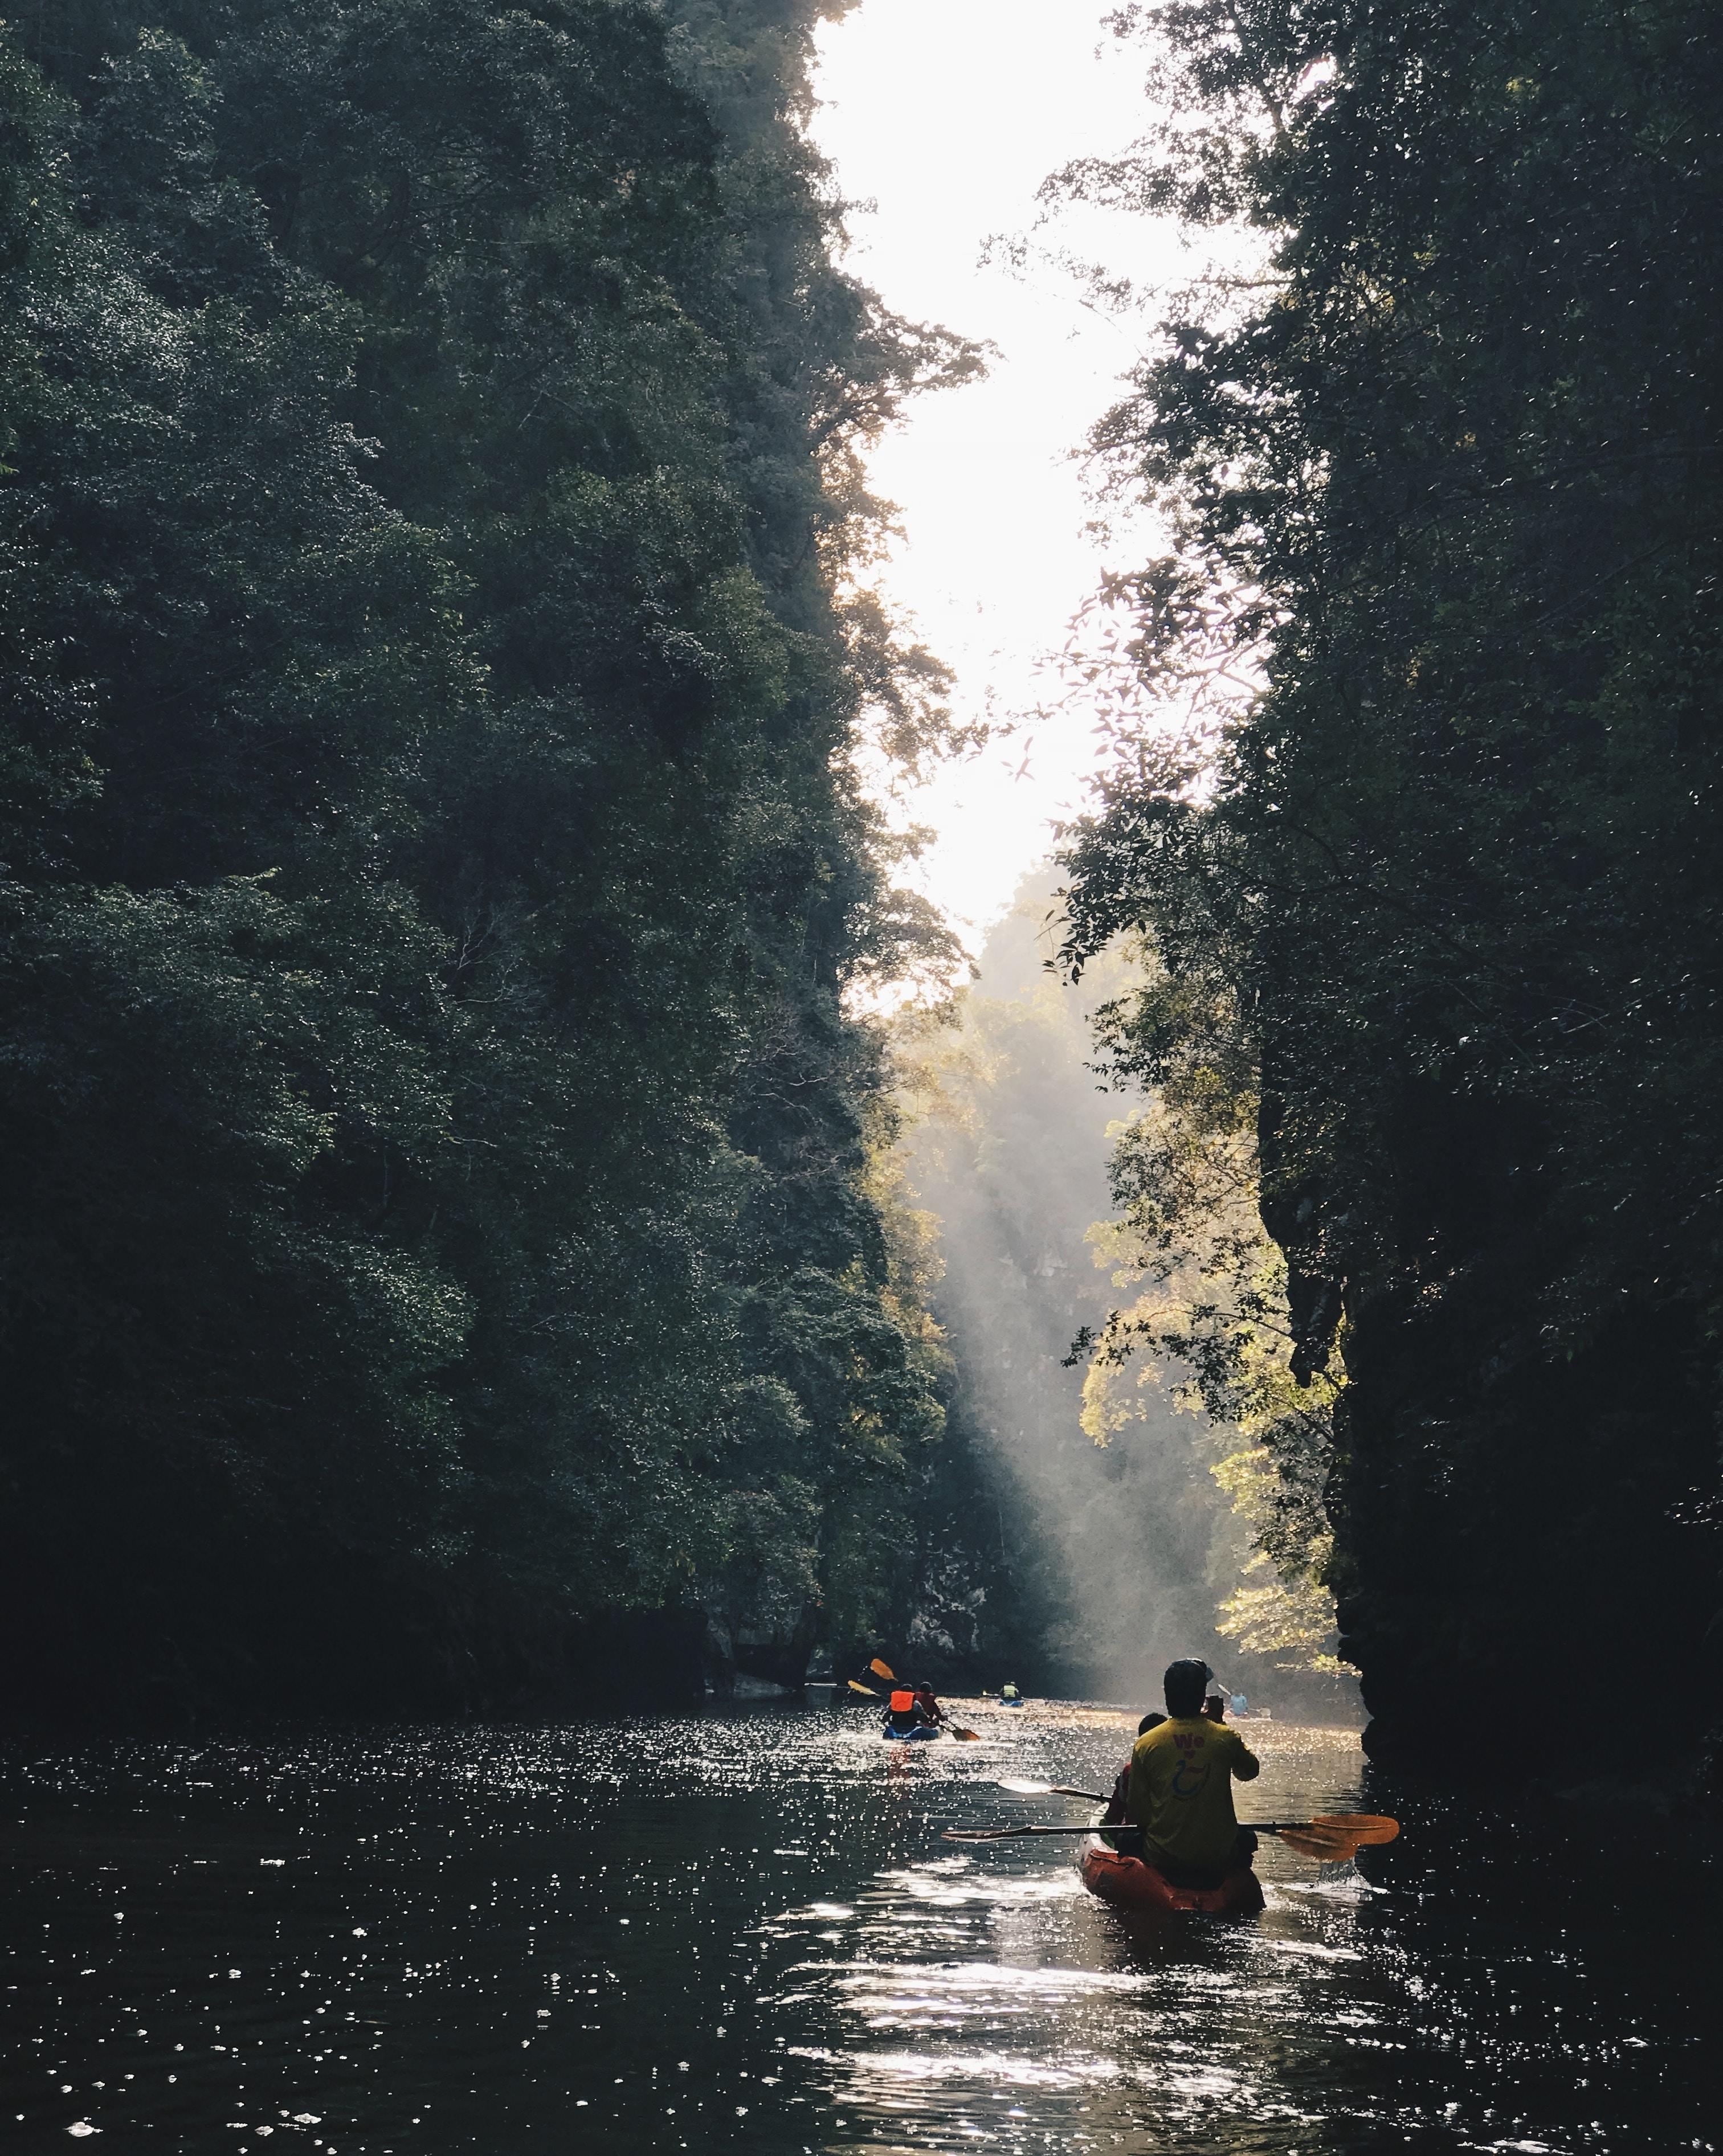 person riding on kayak